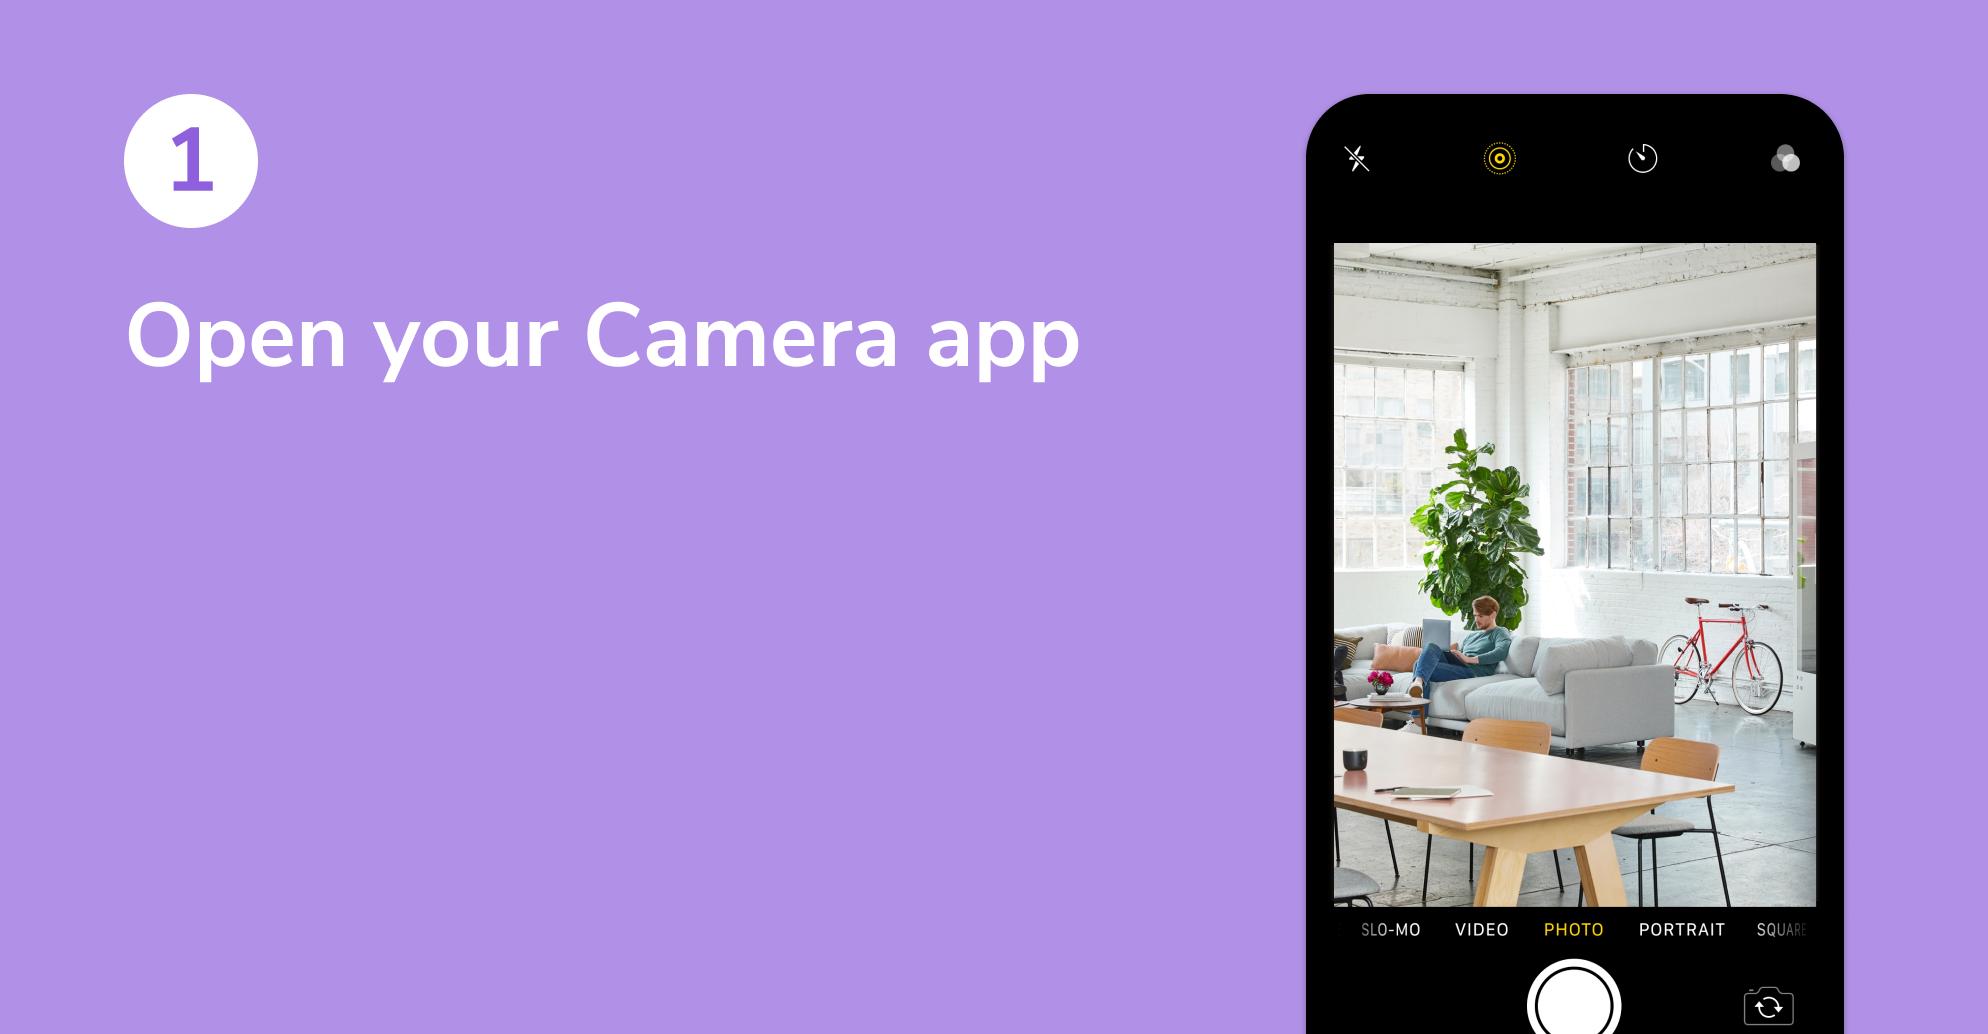 Open your Camera app